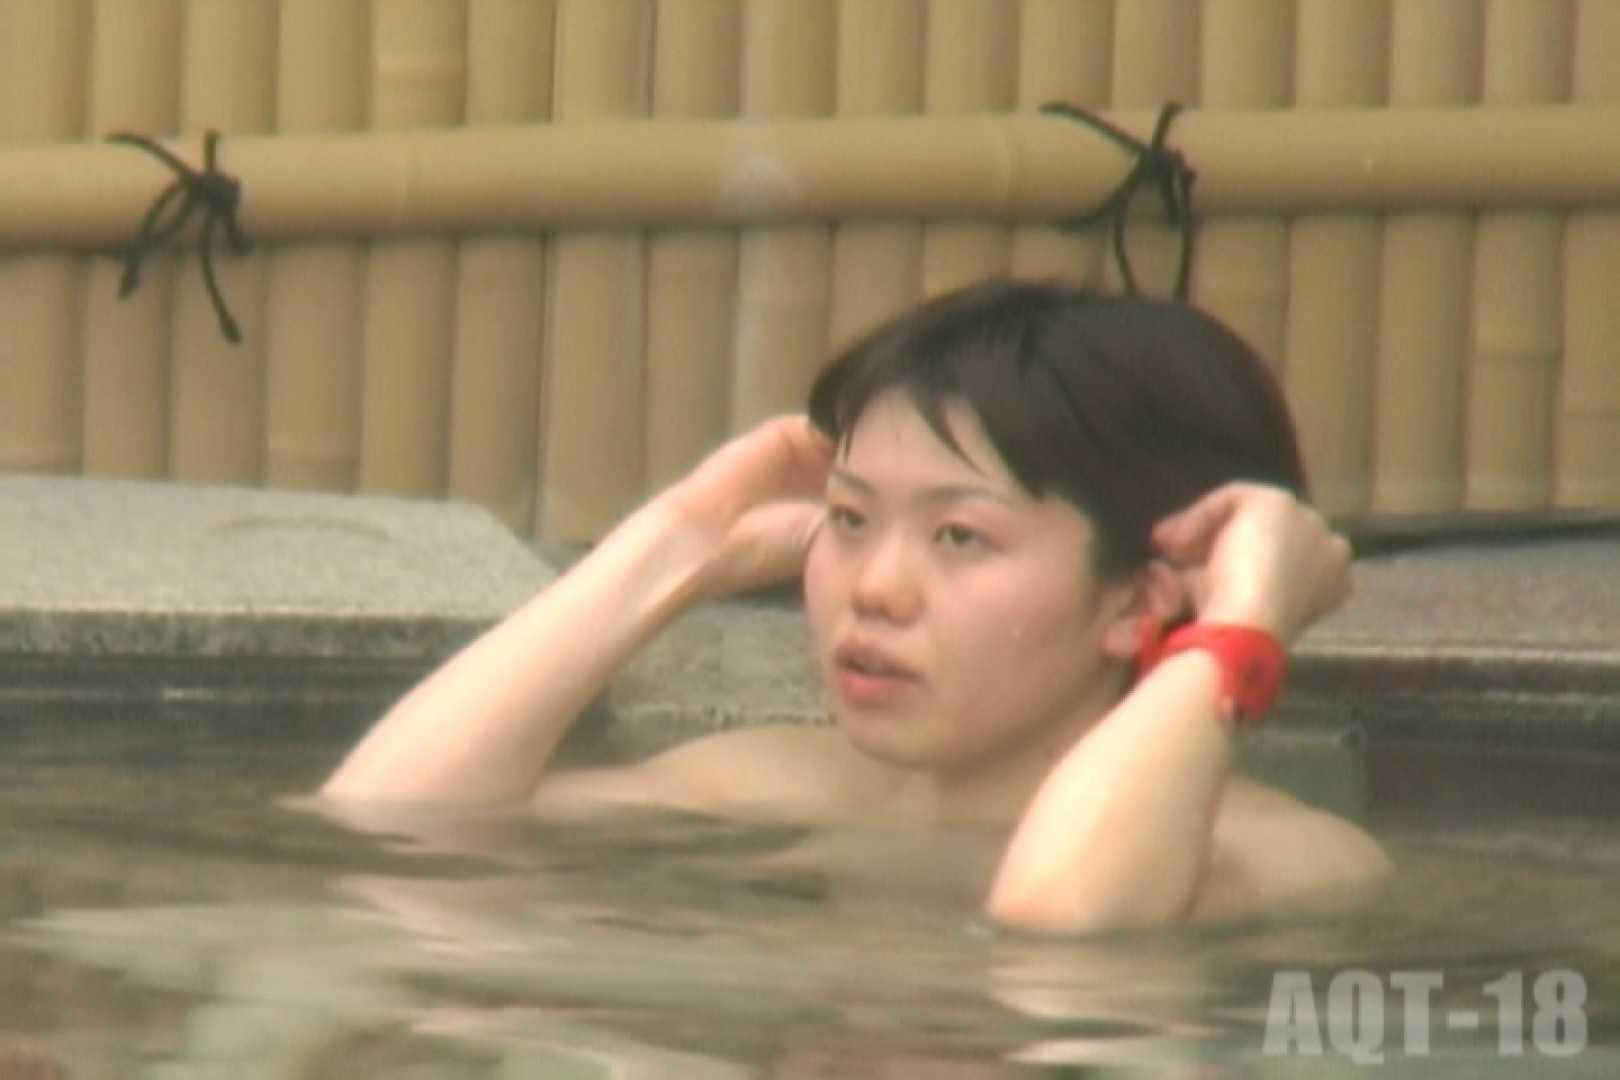 Aquaな露天風呂Vol.861 露天風呂 オメコ無修正動画無料 107連発 41